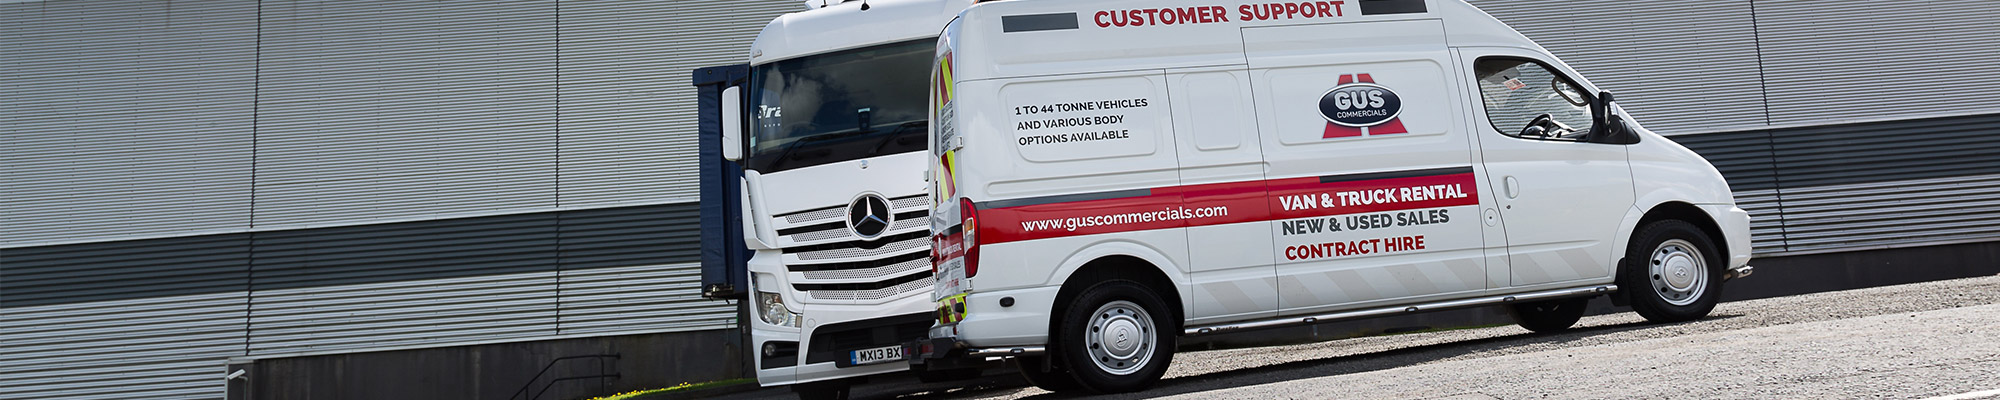 Gus Commercials' 24 hour customer service support van